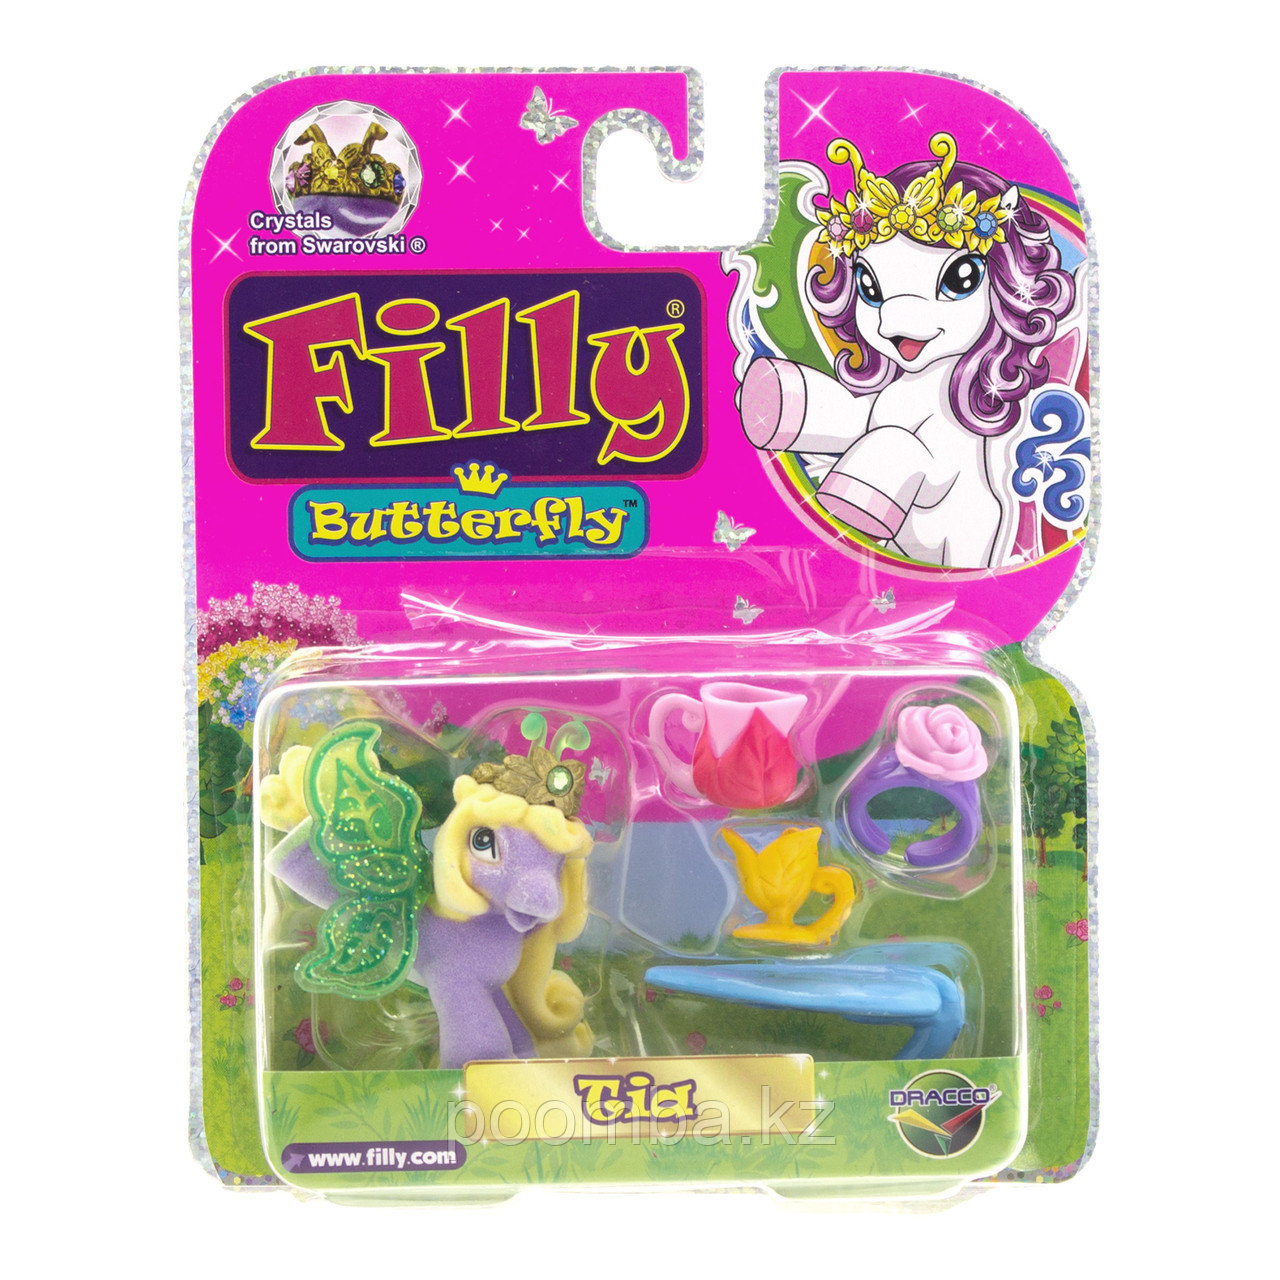 "Игровой набор Filly""Butterfly Glitter""с аксессуарами - Tia"